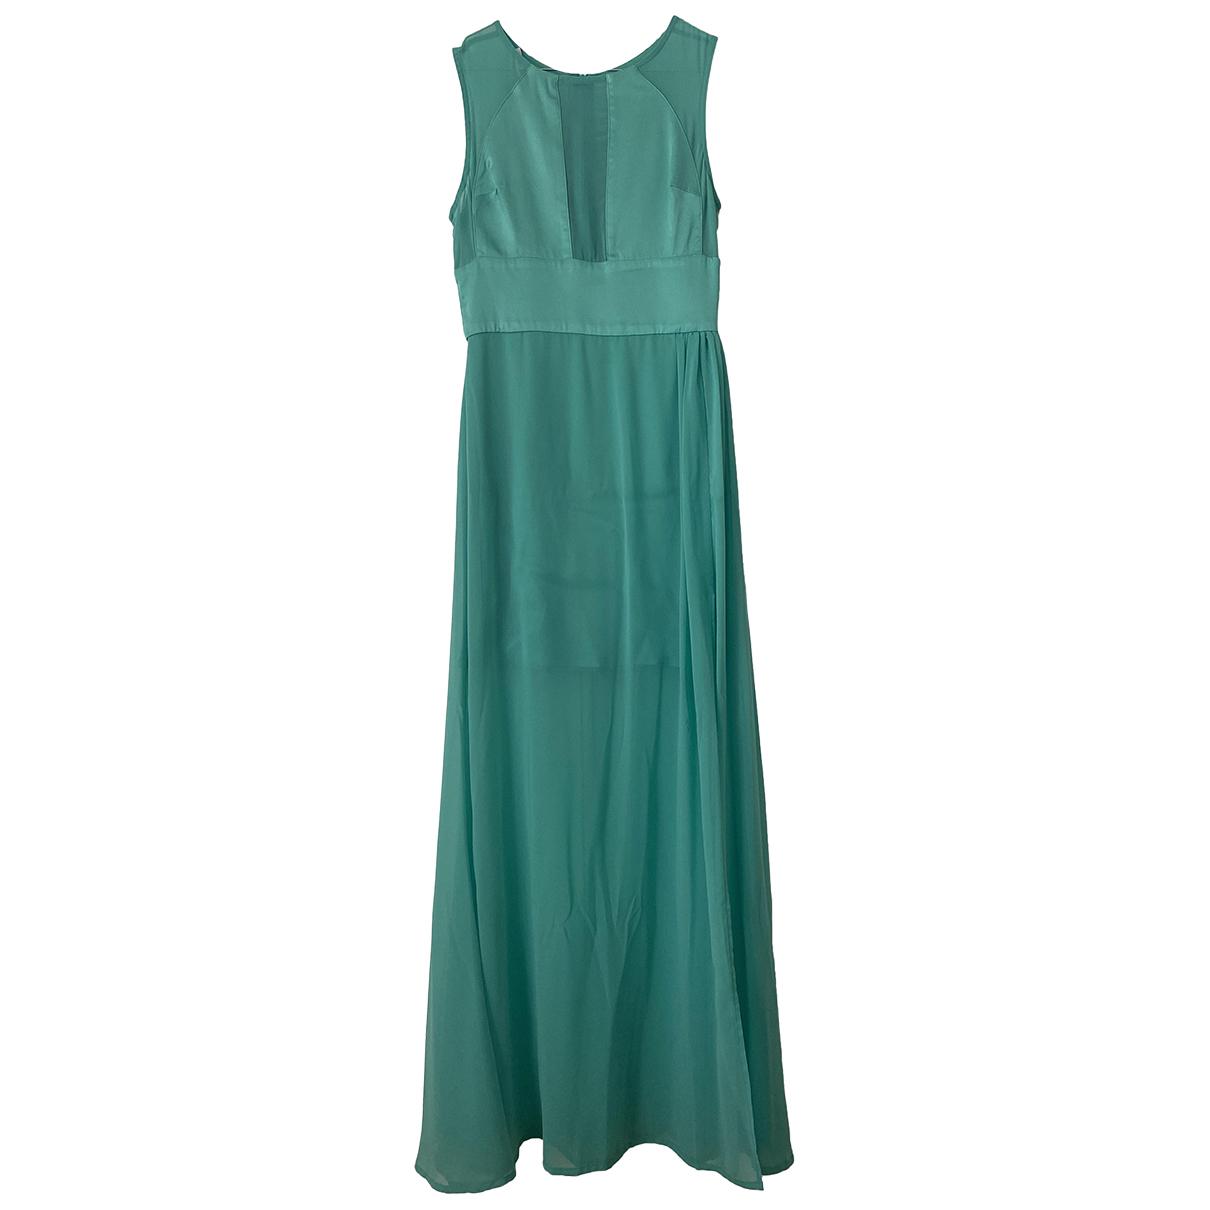 Flavio Castellani \N Kleid in  Gruen Polyester